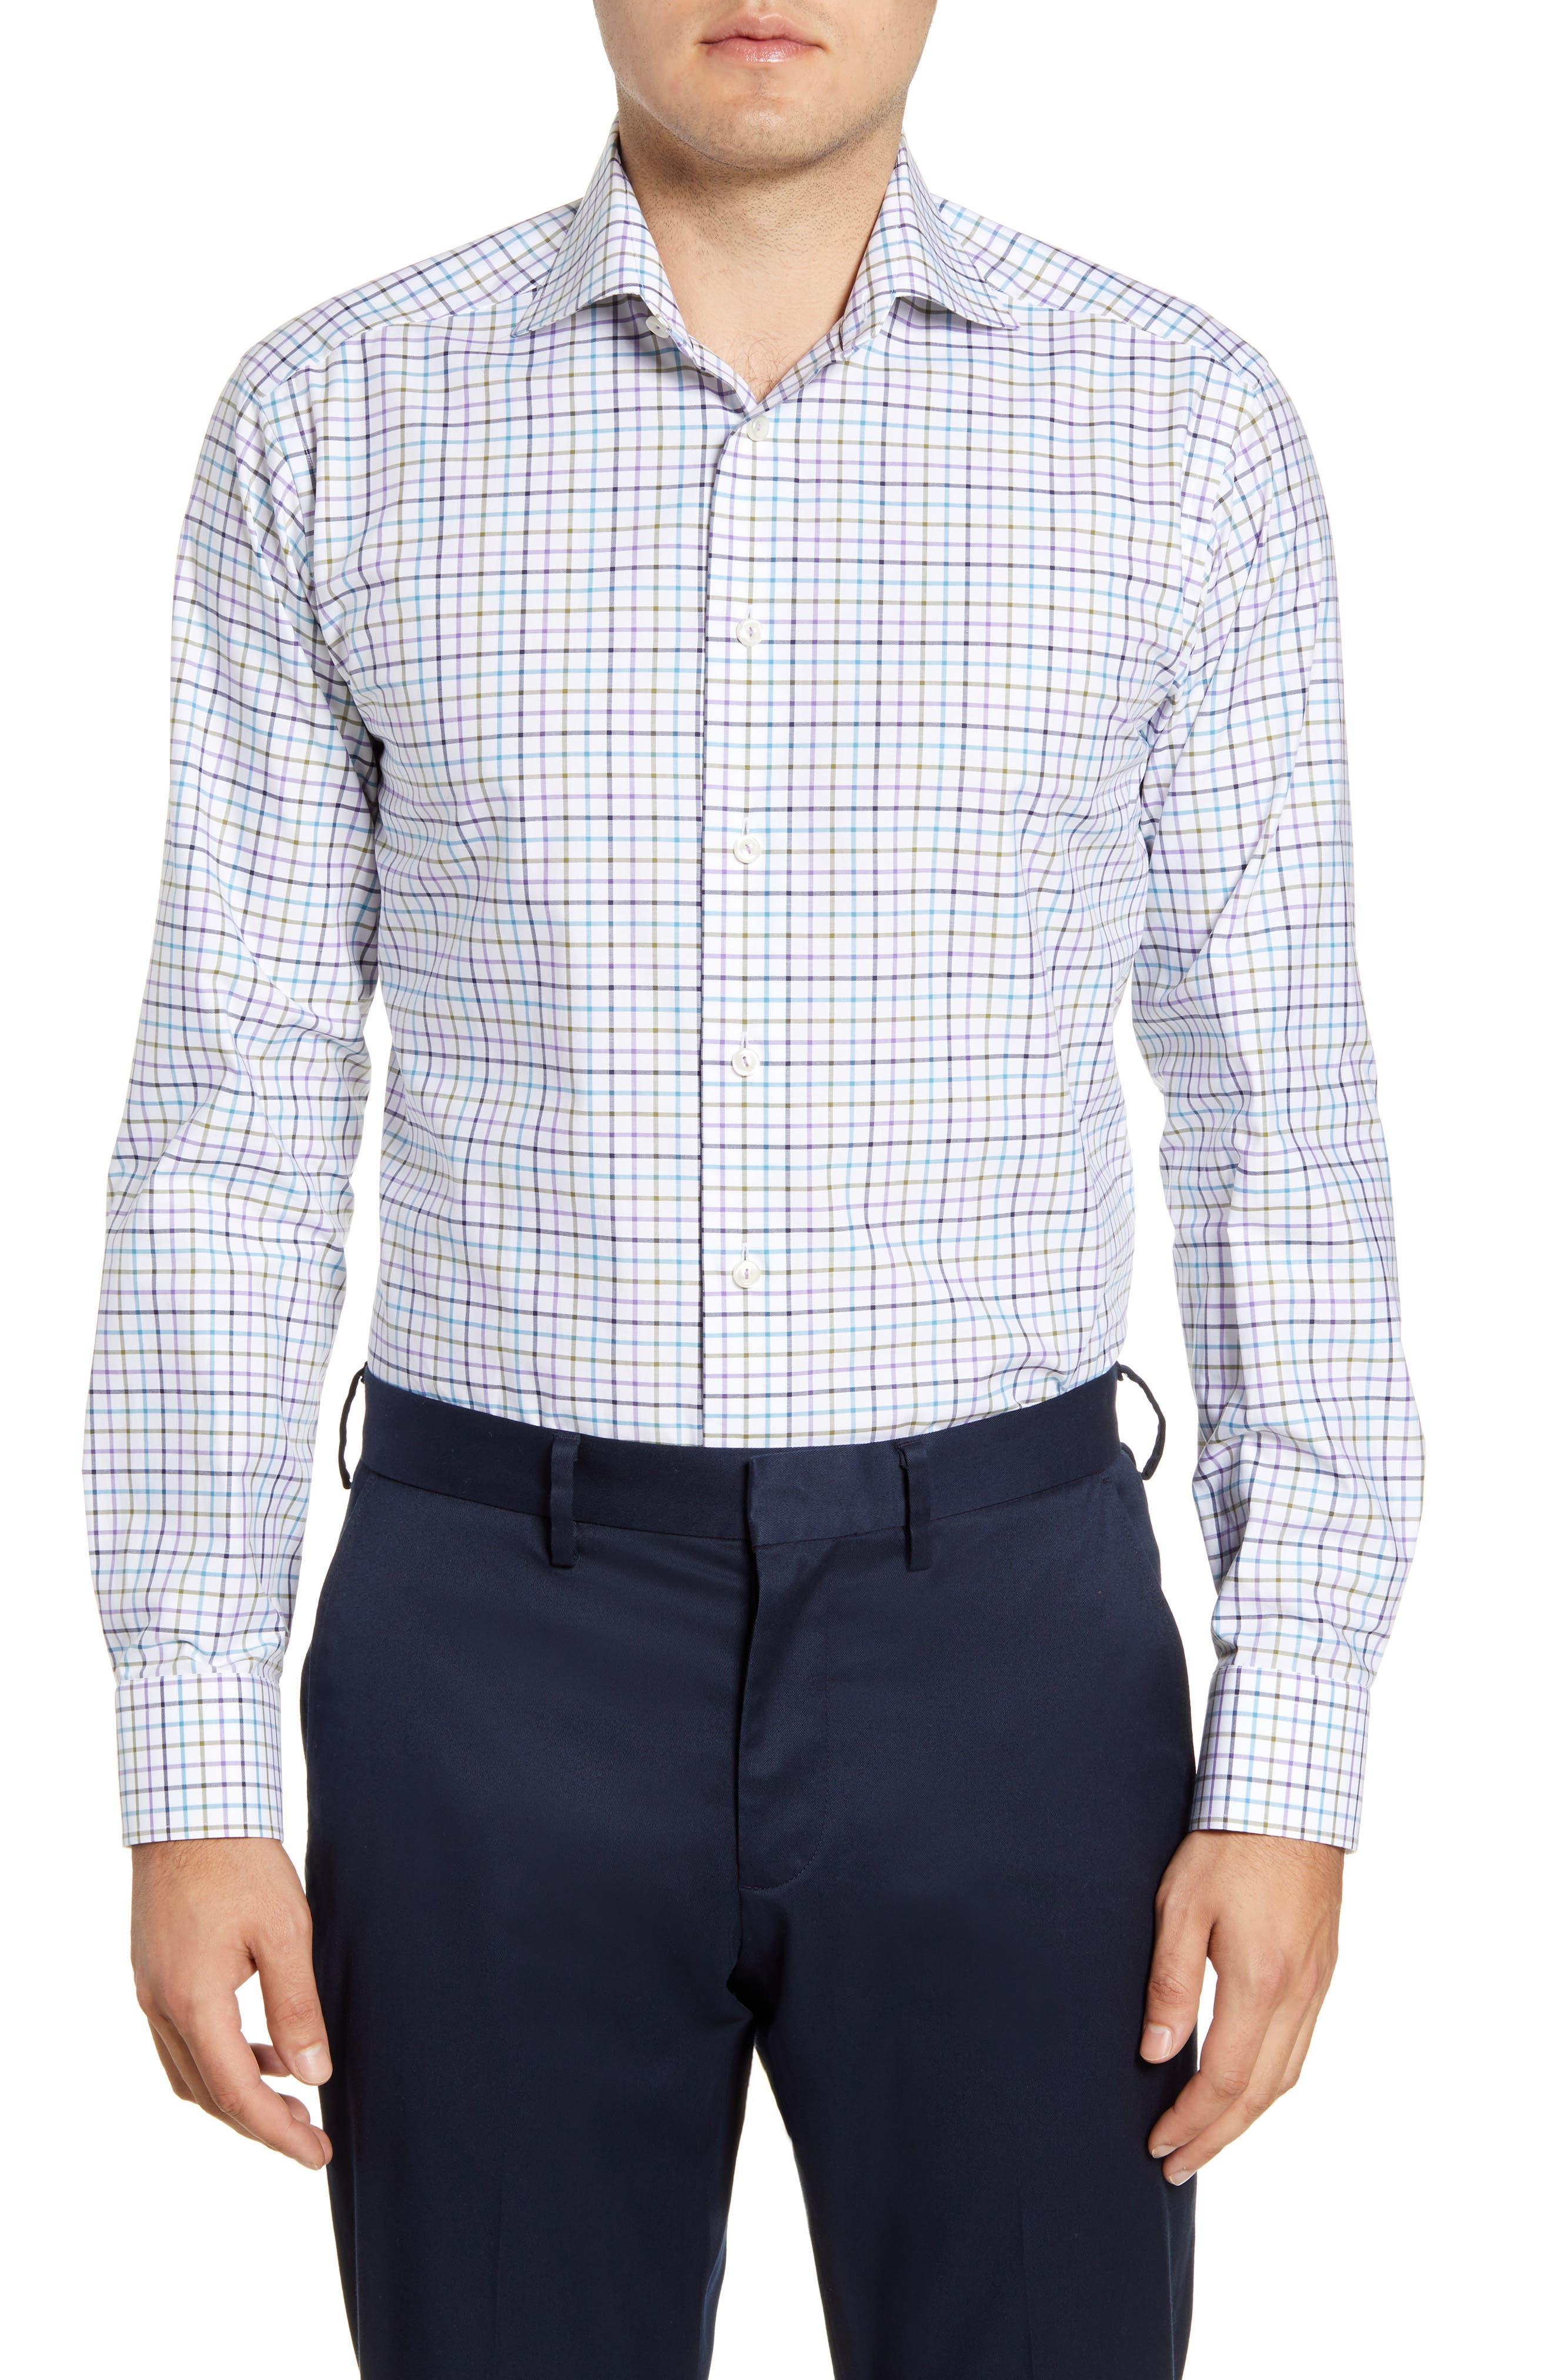 Image of Eton Grid Check Slim Fit Dress Shirt